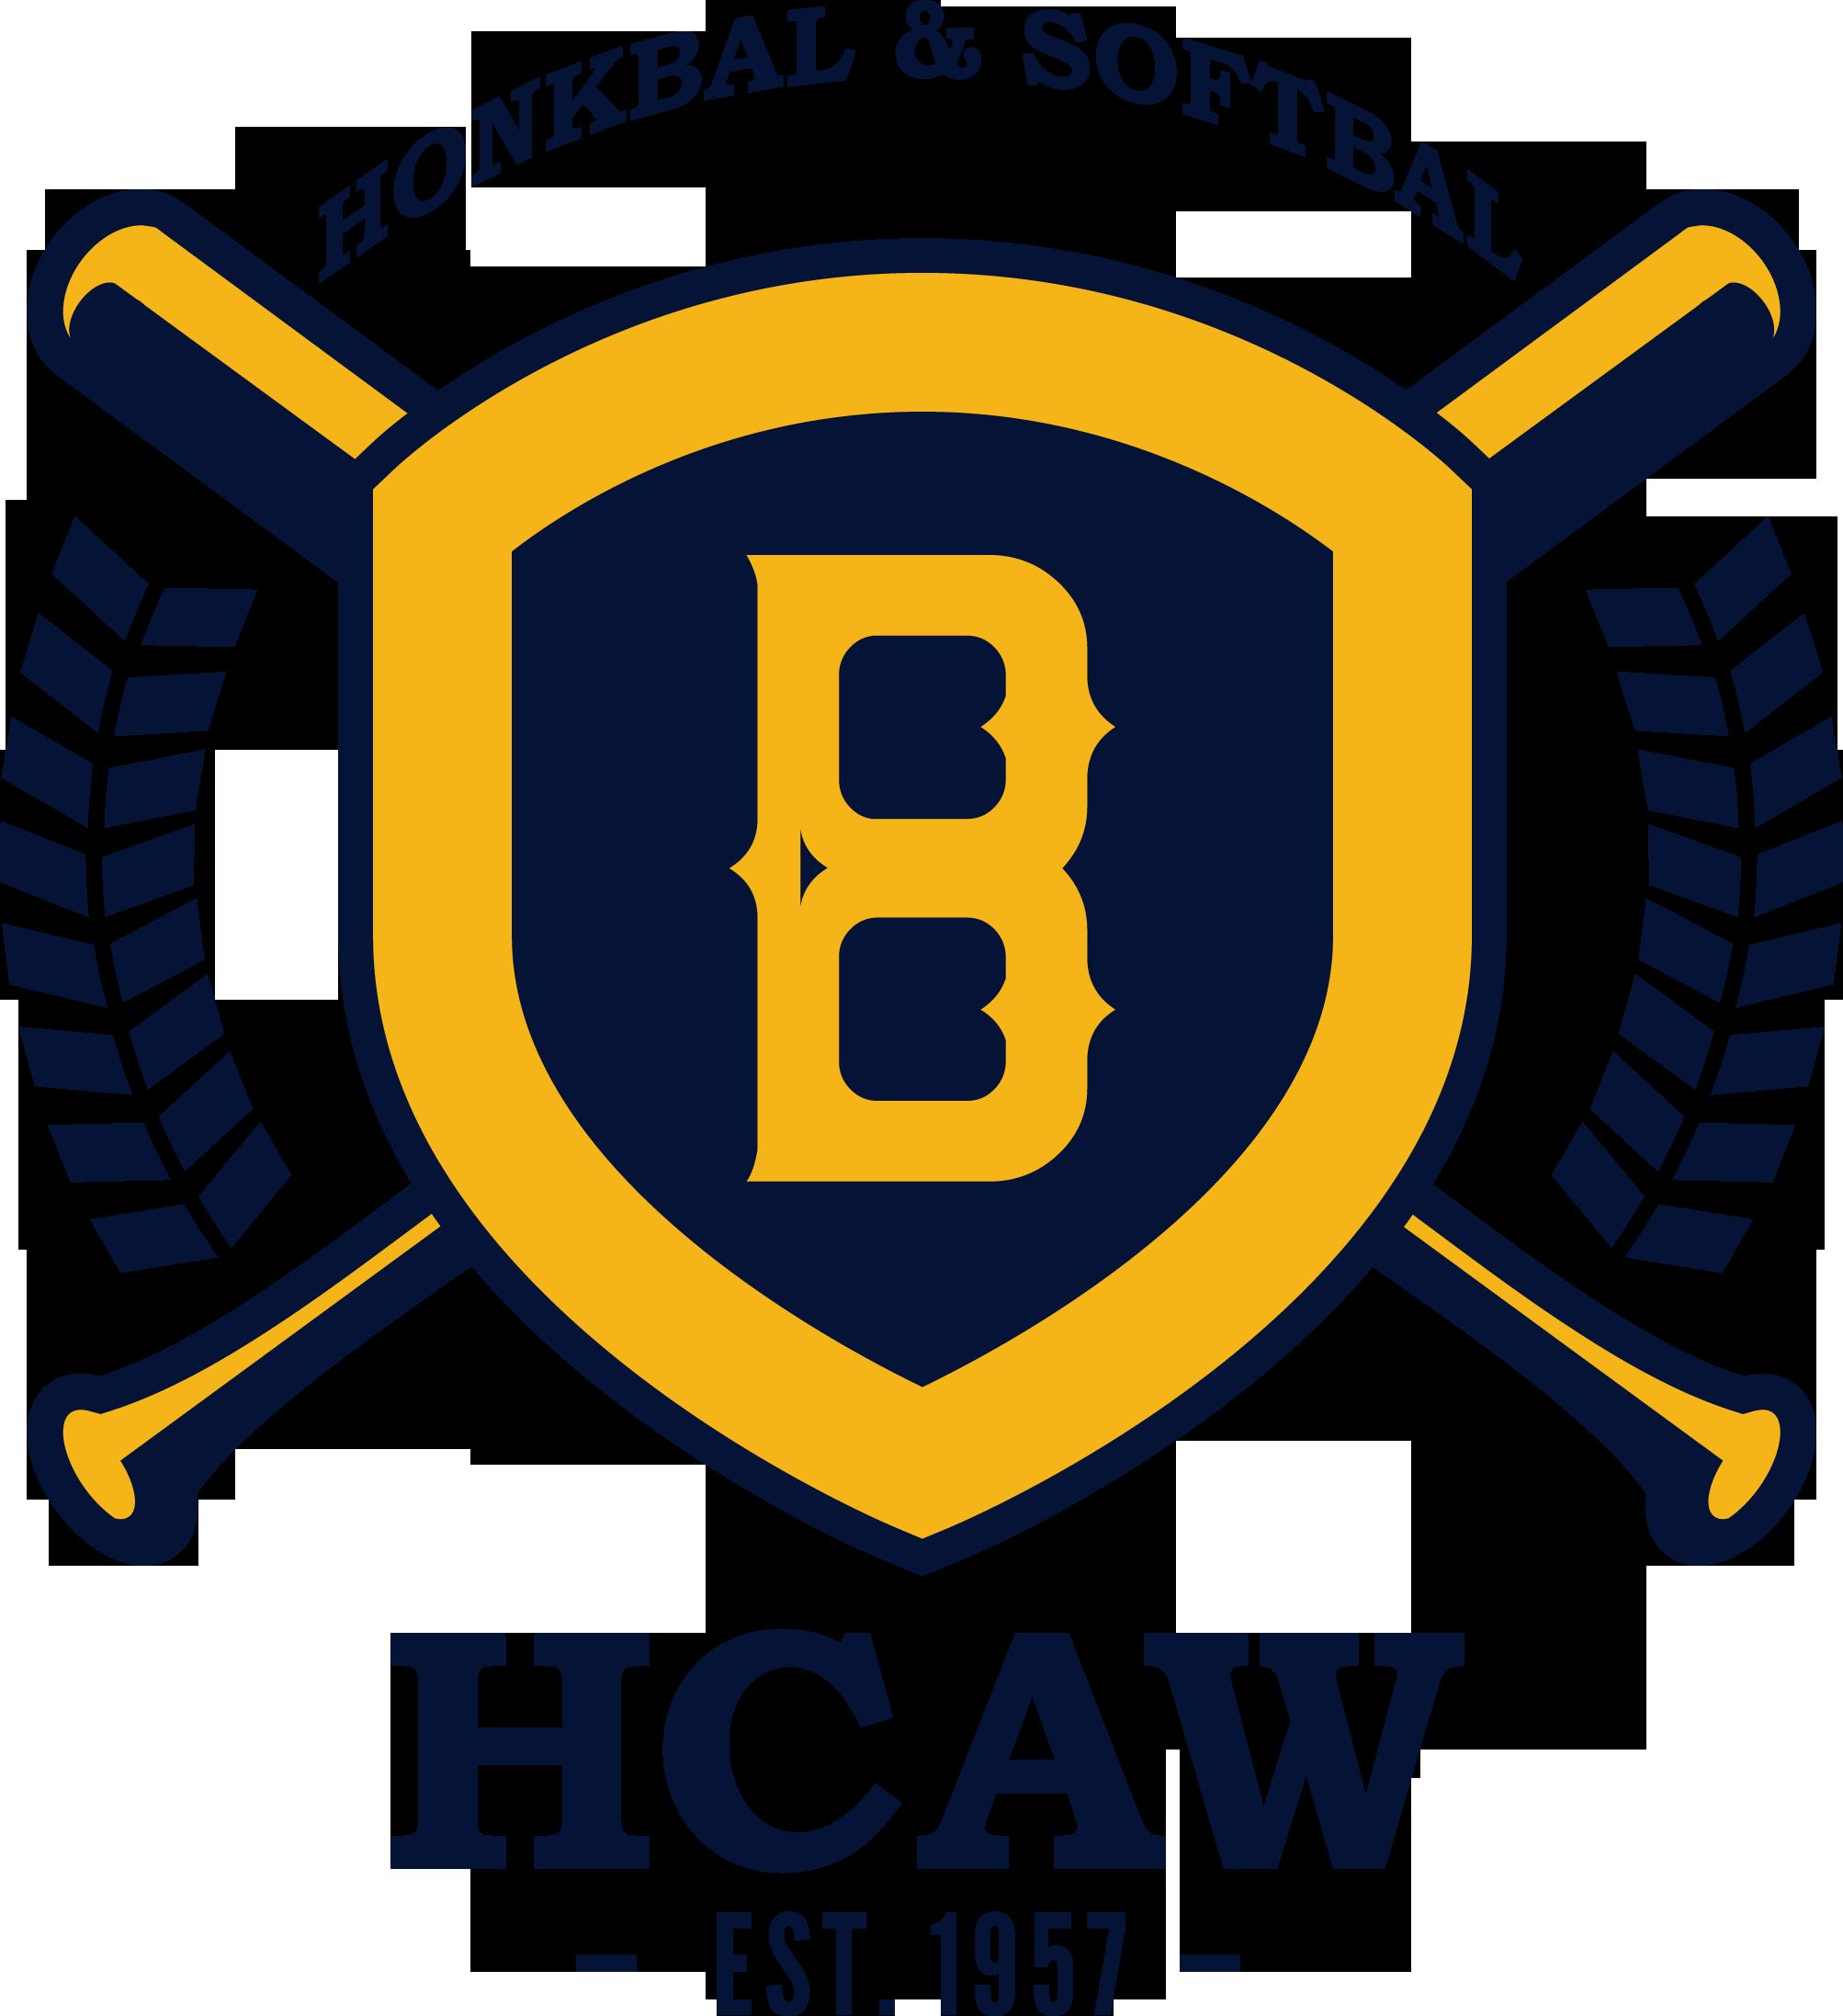 Logo Hcaw Baseball From The Netherlands Baseball Teams Logo Baseball Softball Baseball